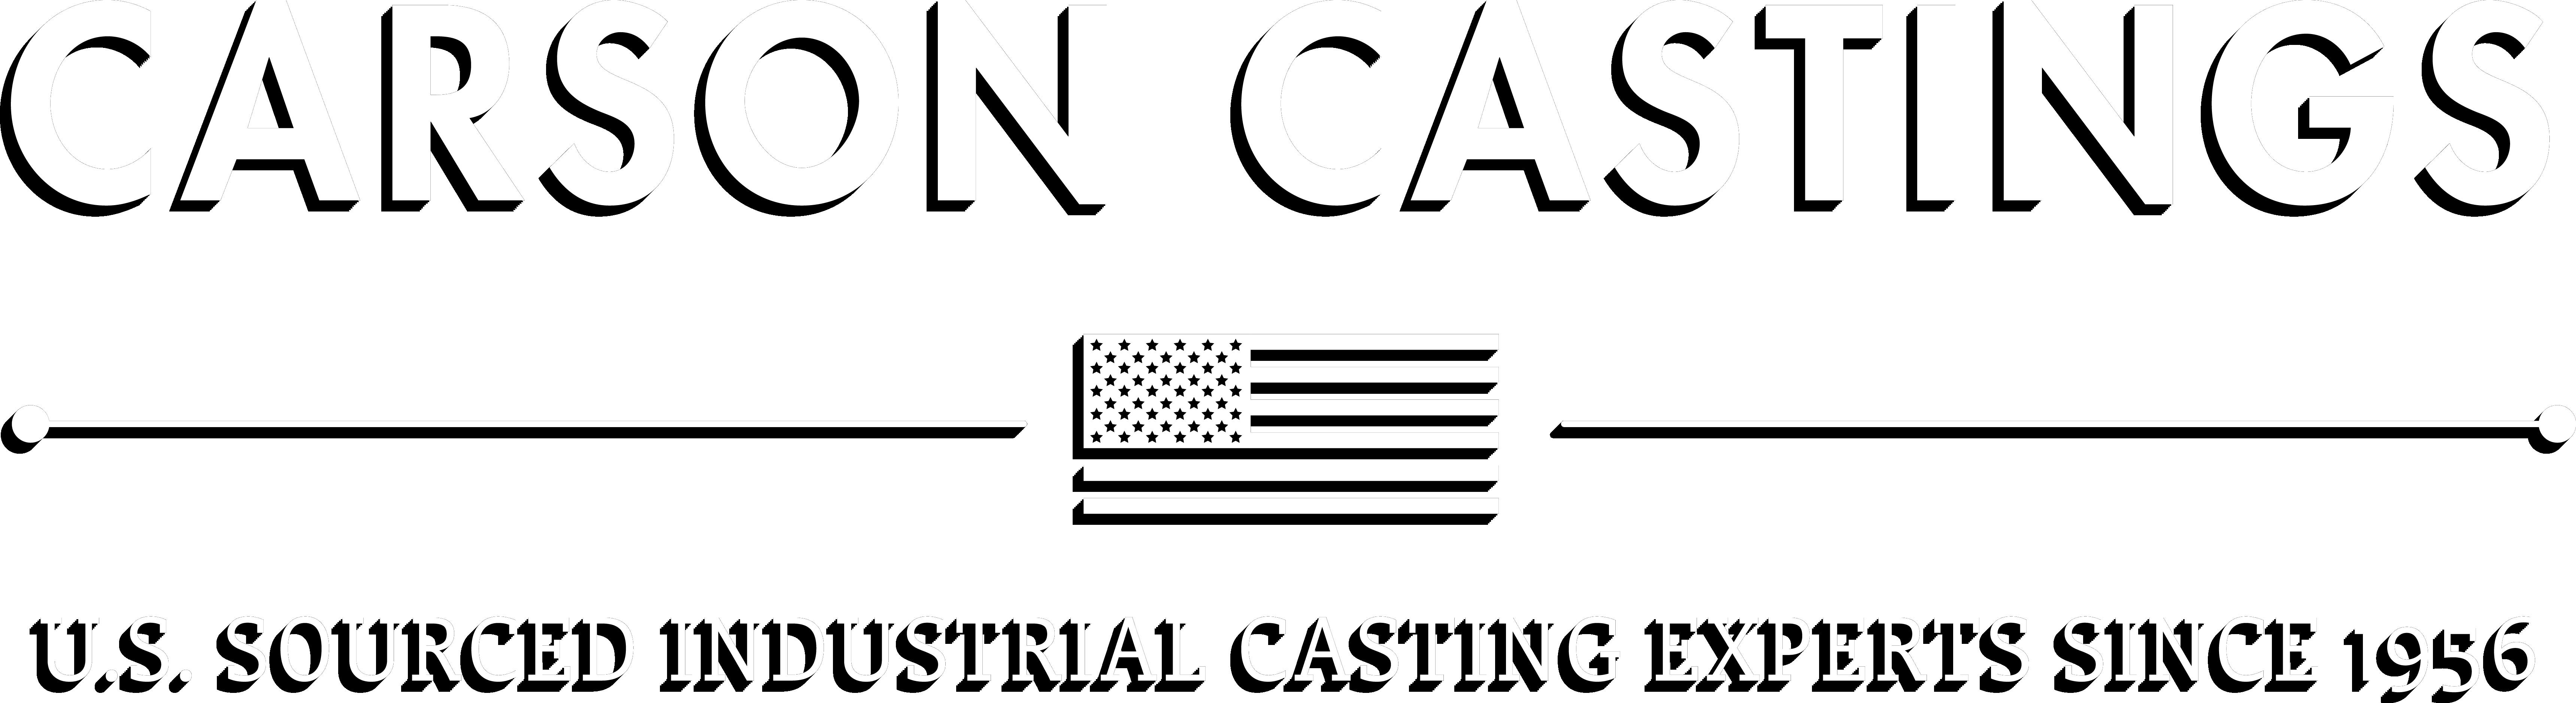 Carson Castings